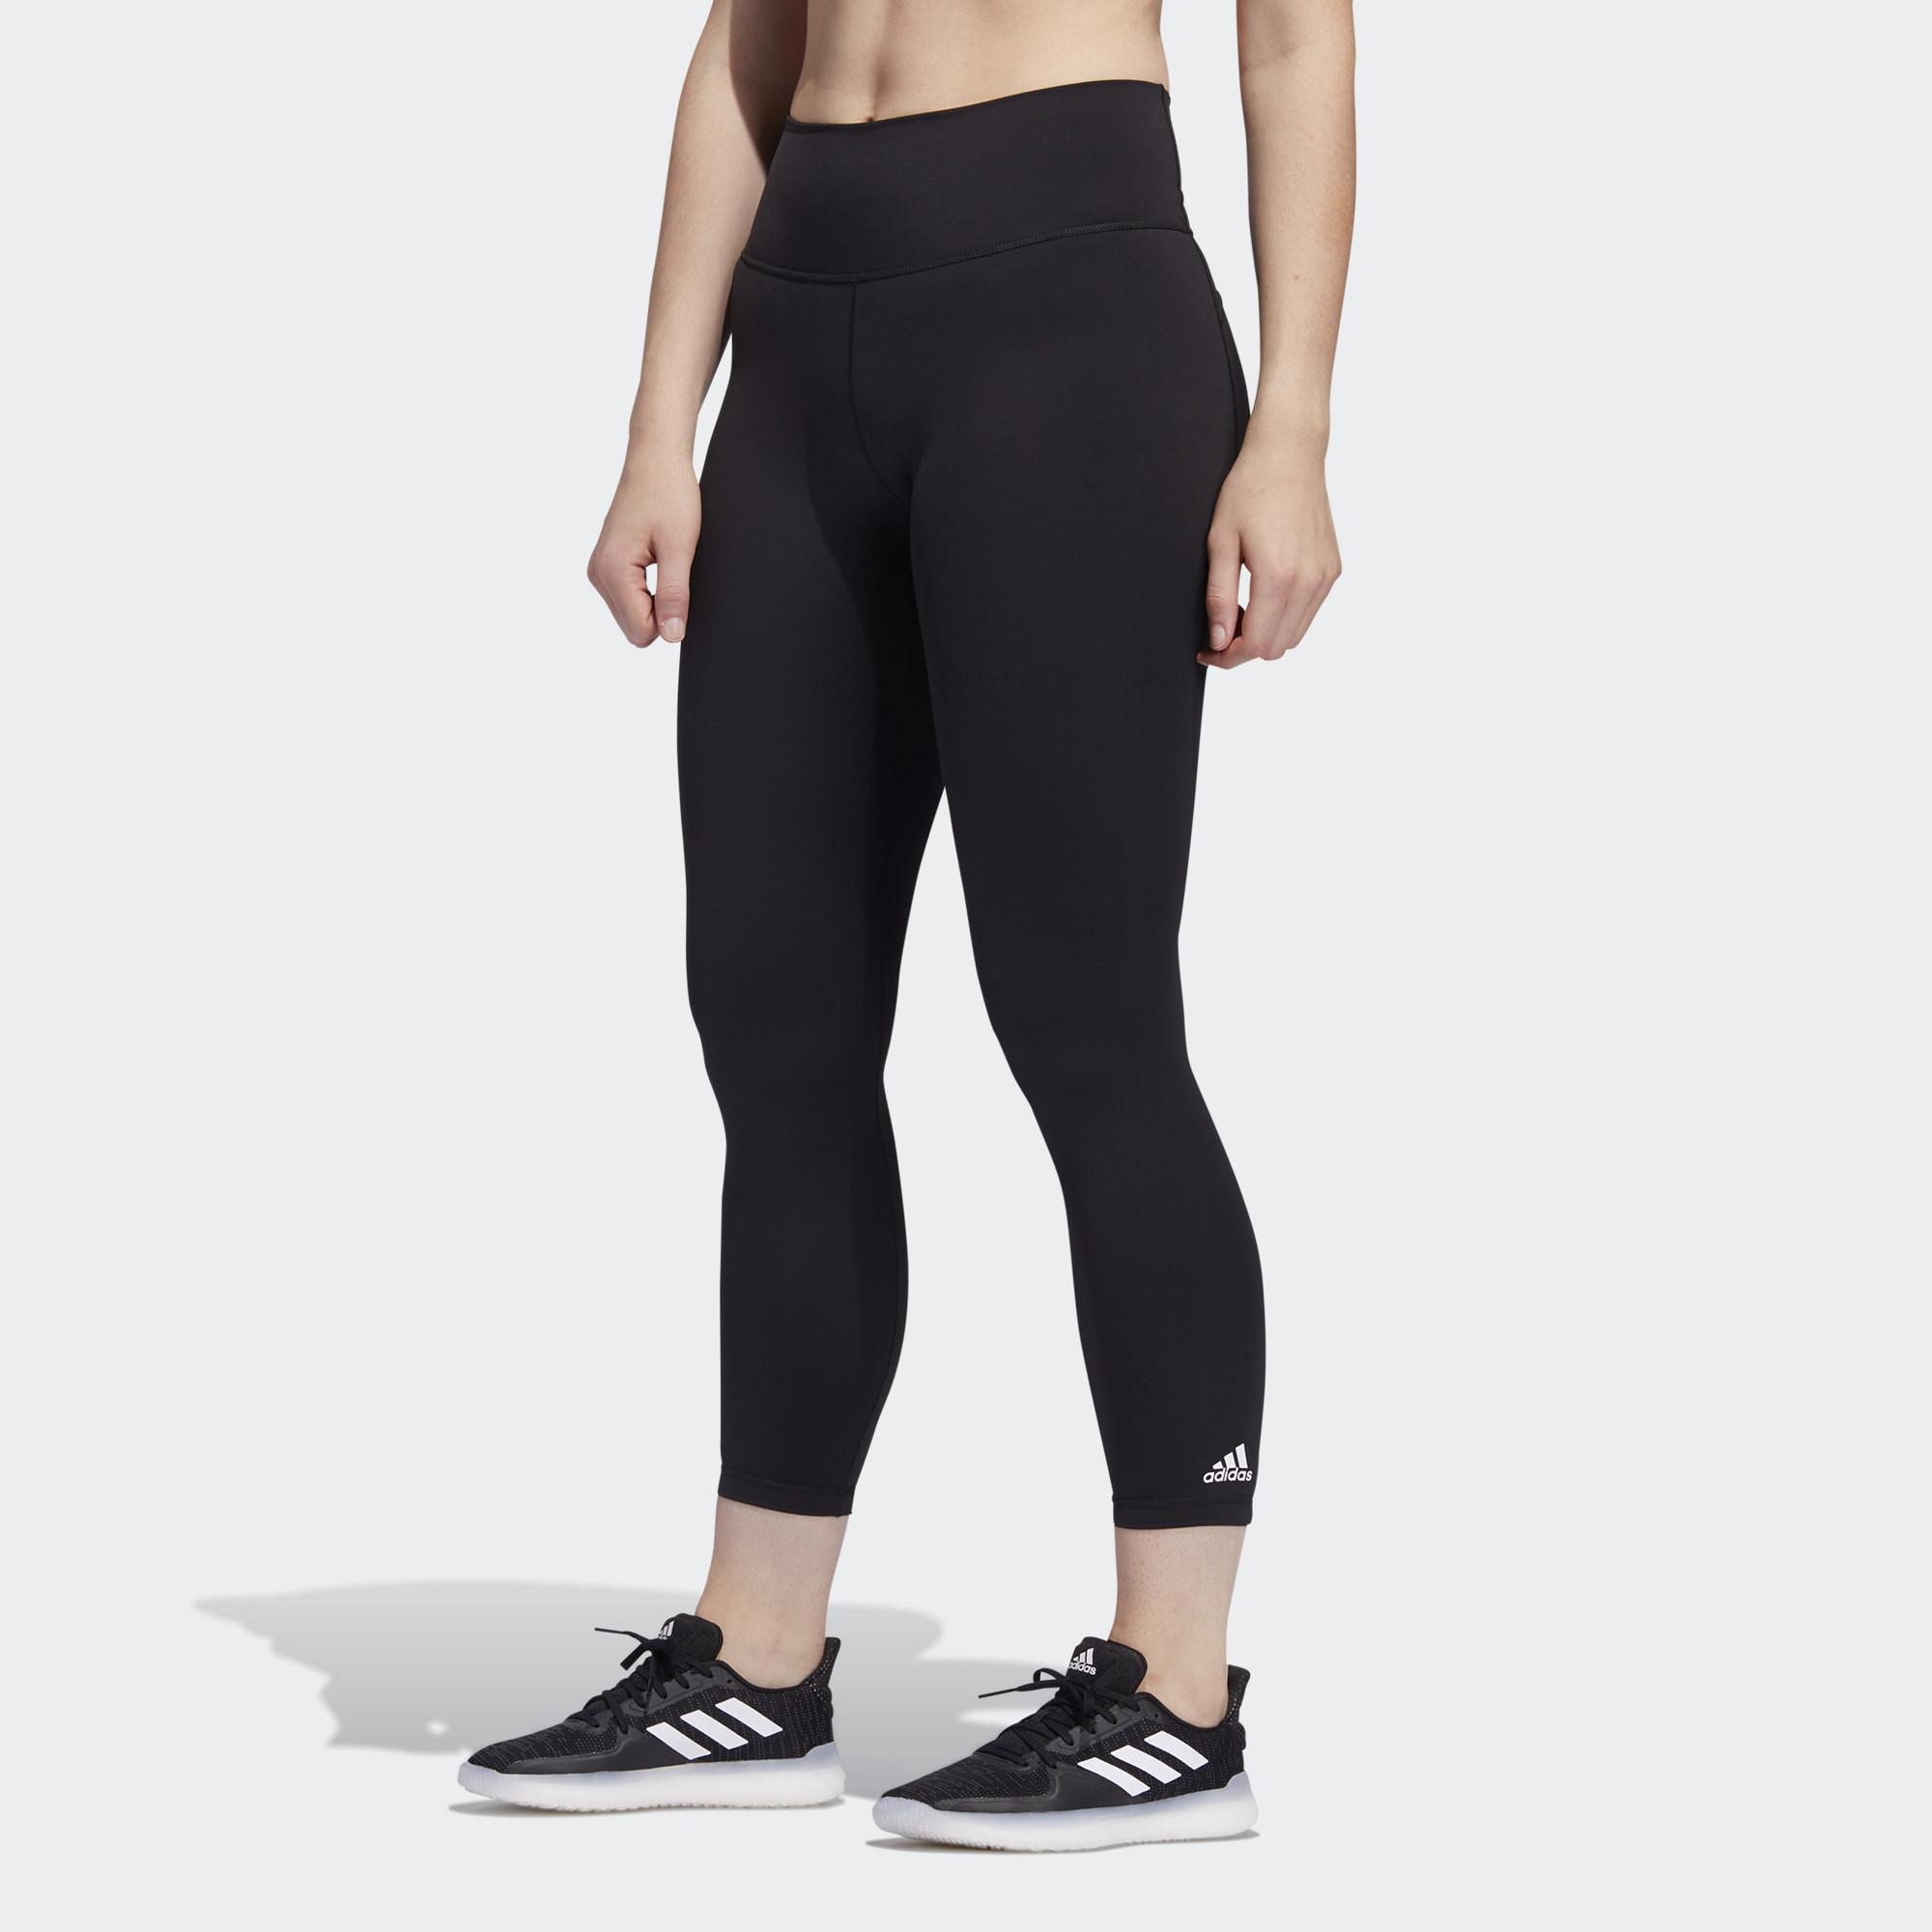 adidas Believe This 7/8 Γυναικείο Κολάν (9000045107_1469)